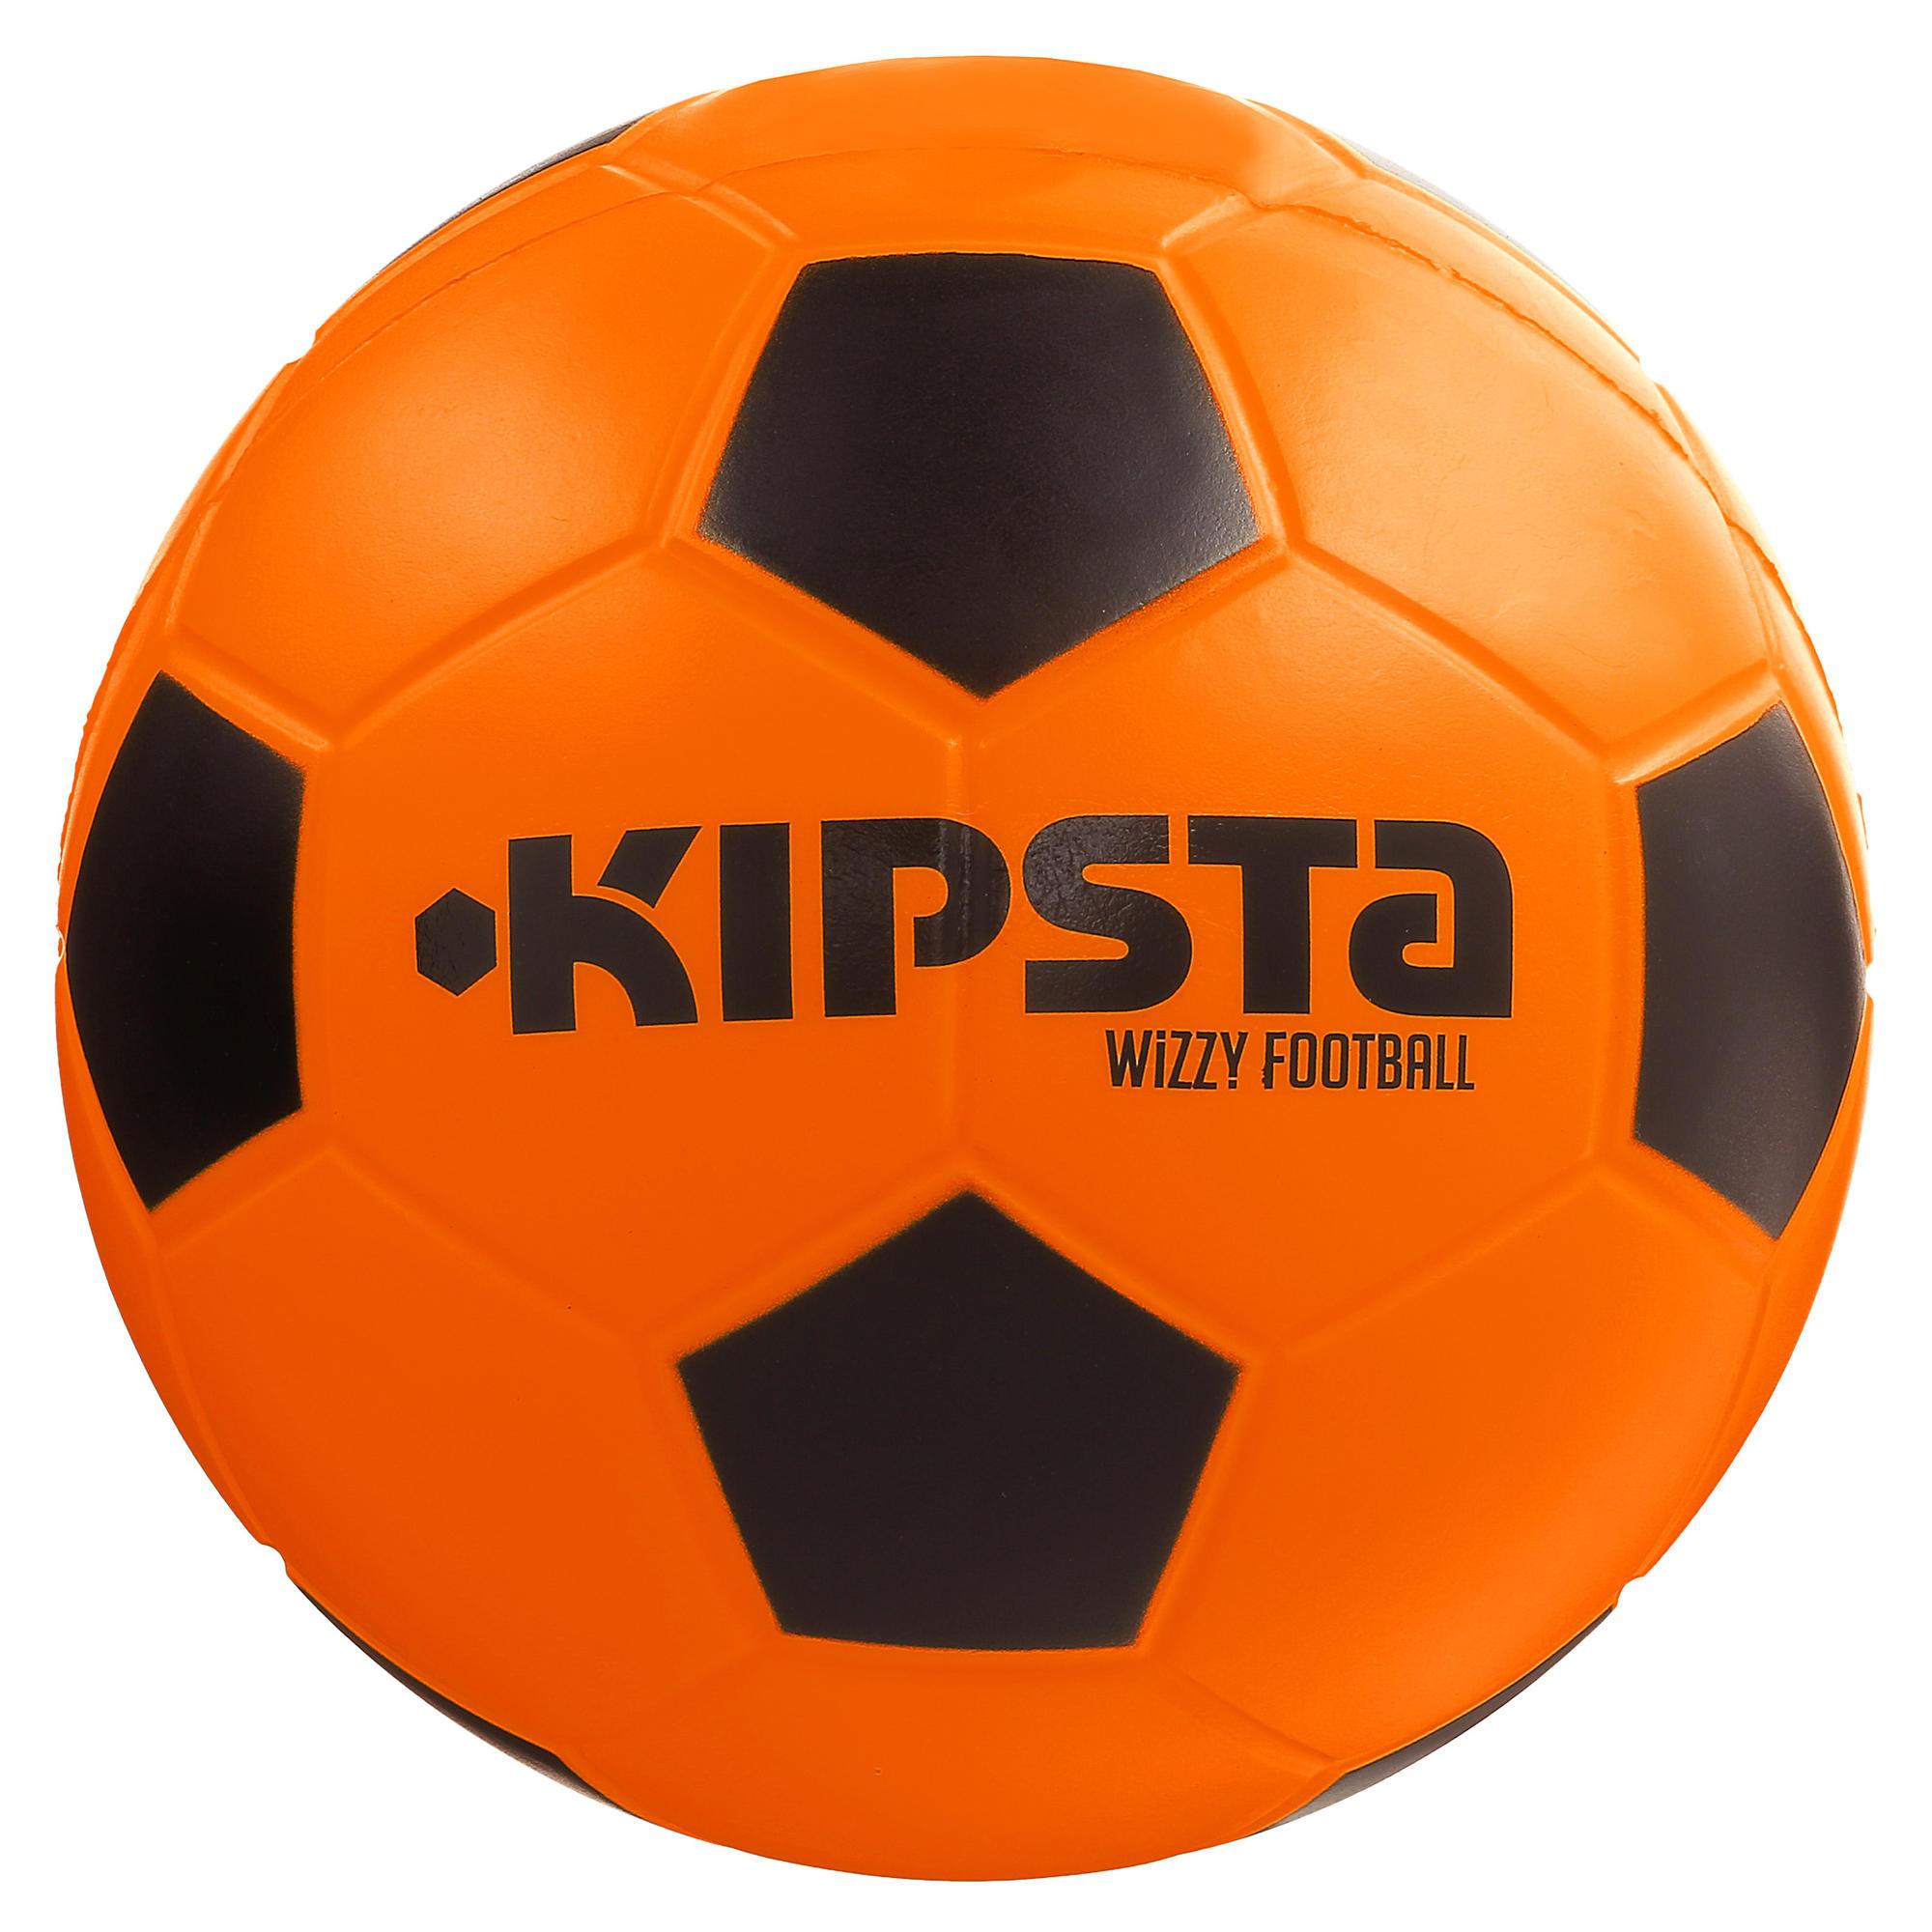 ballon de football en mousse wizzy taille 4 kipsta by. Black Bedroom Furniture Sets. Home Design Ideas